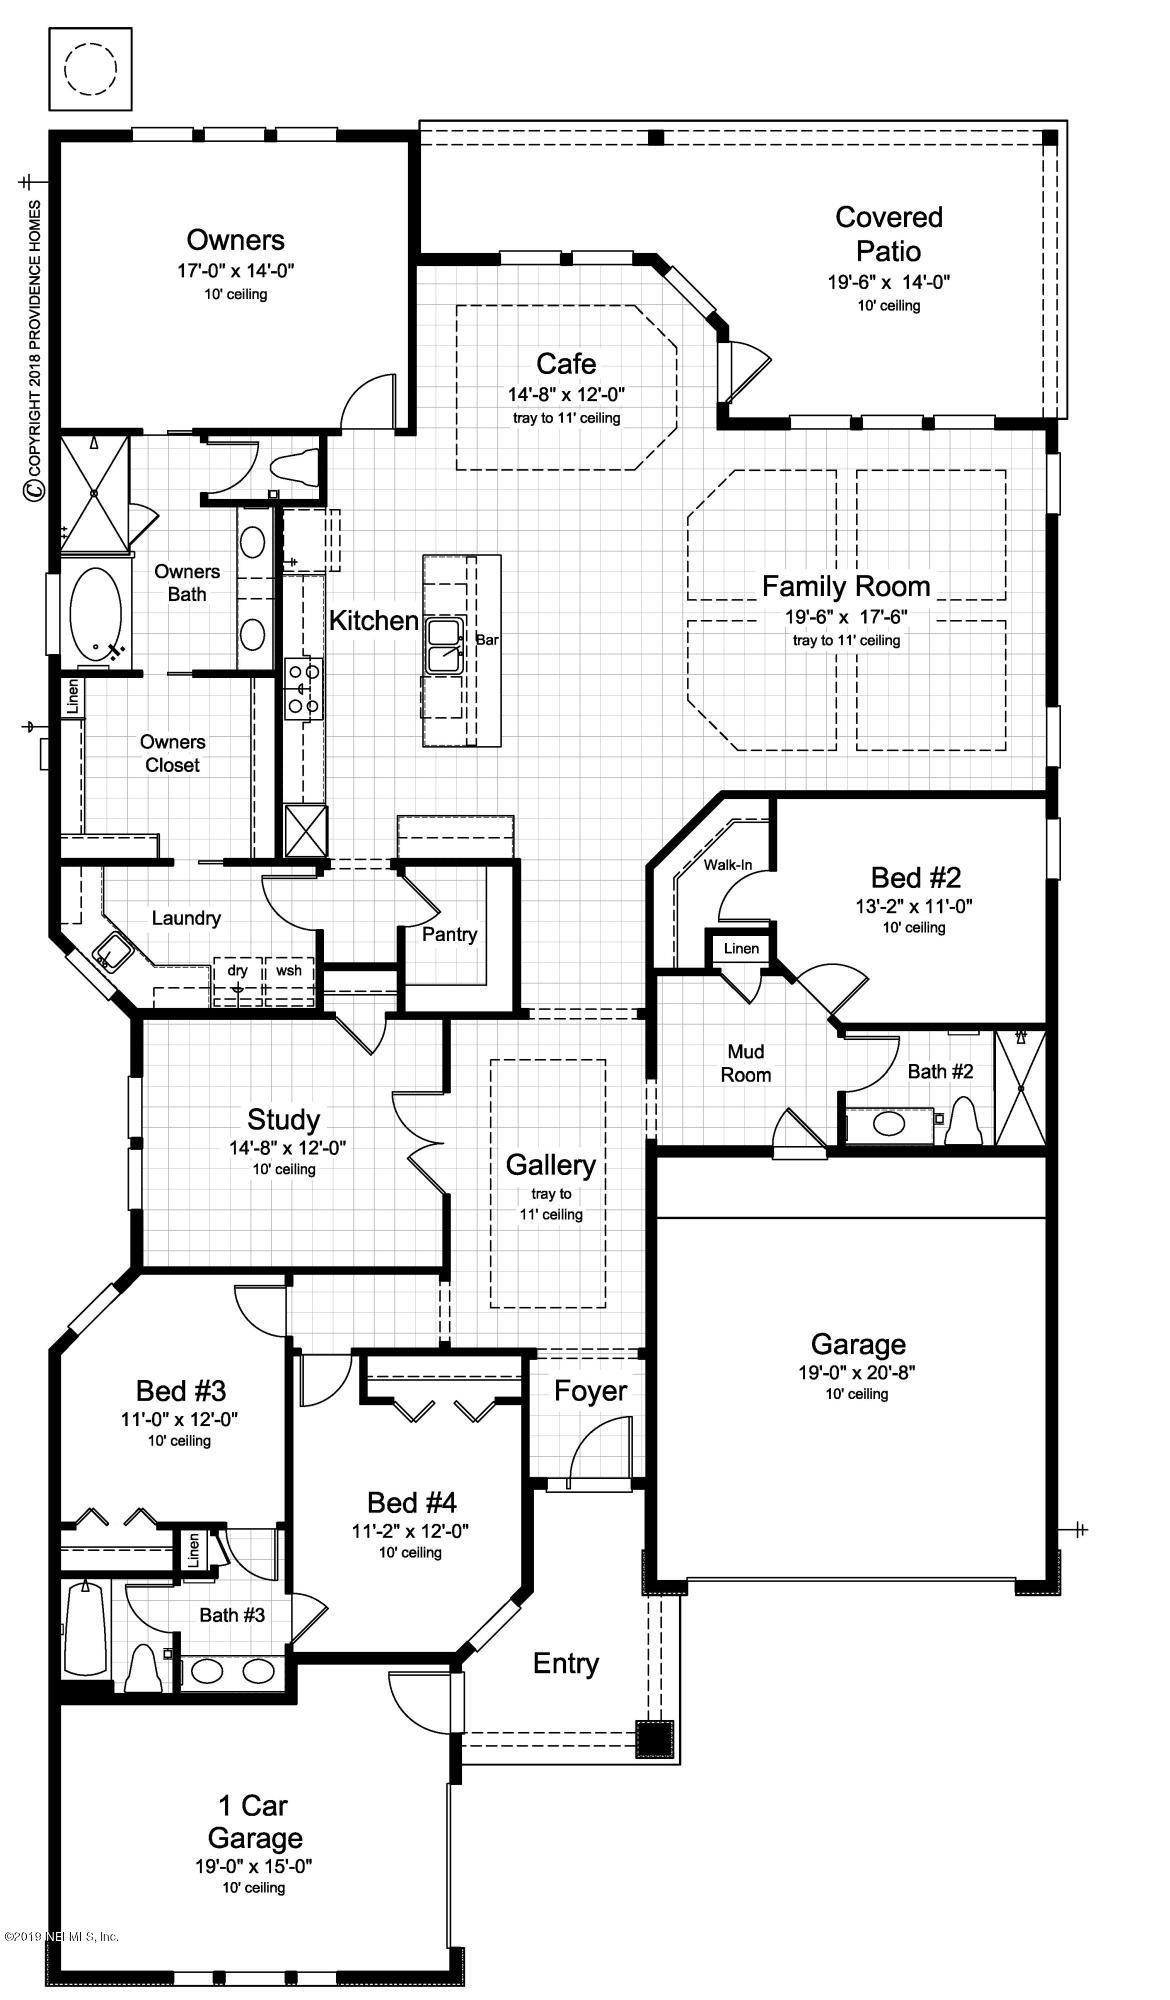 139 QUAIL VISTA, PONTE VEDRA, FLORIDA 32081, 4 Bedrooms Bedrooms, ,3 BathroomsBathrooms,Residential - single family,For sale,QUAIL VISTA,976345